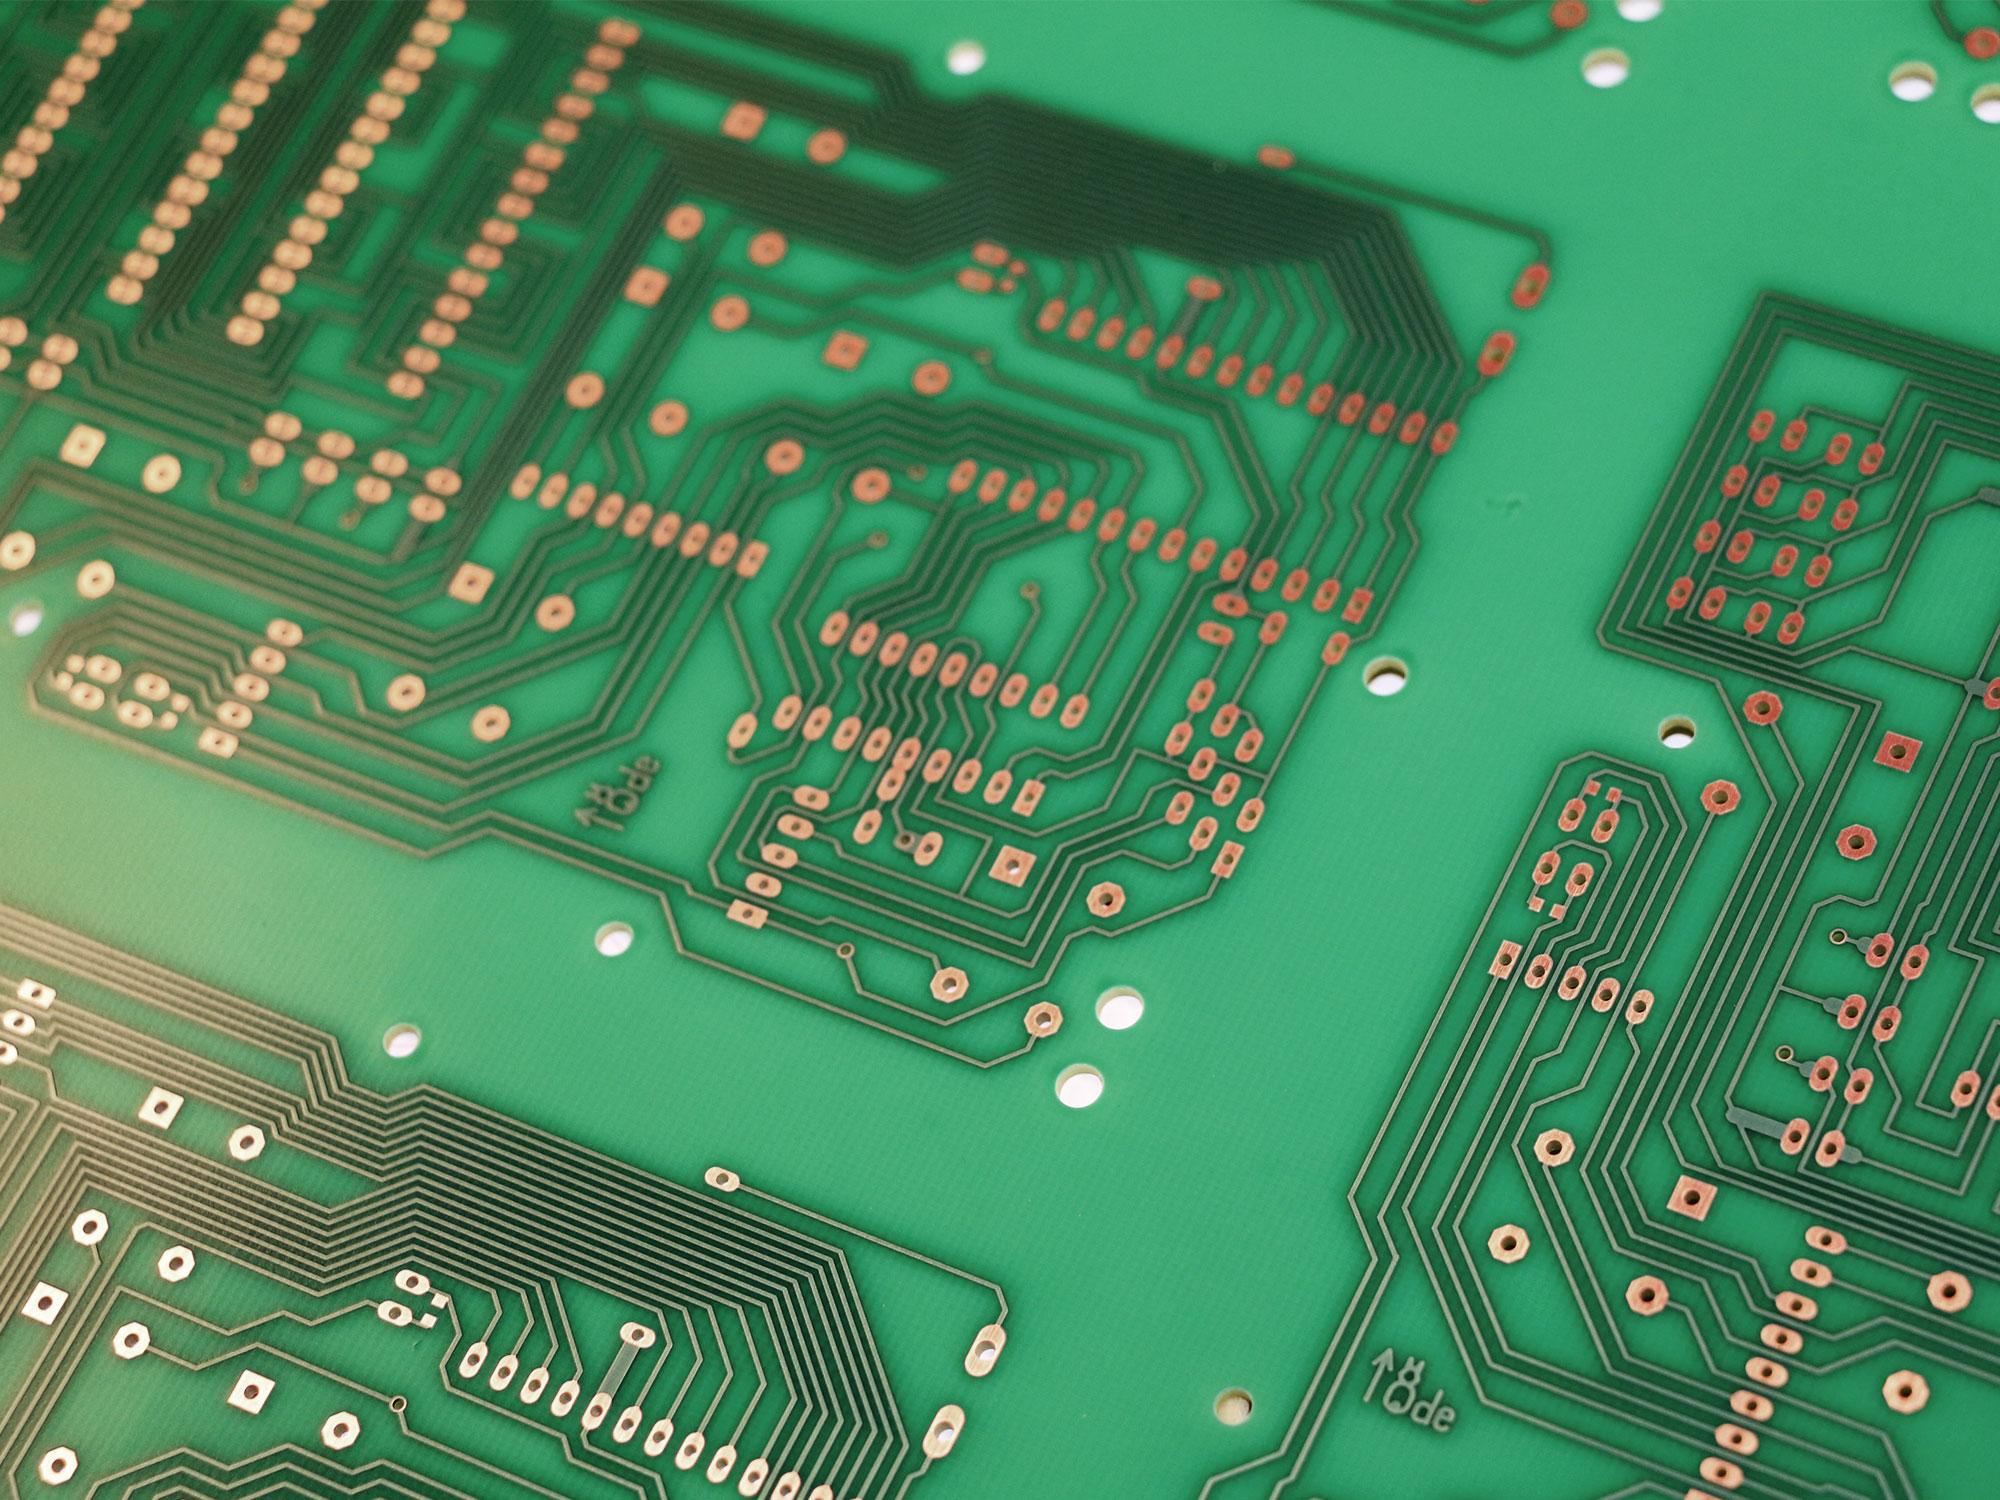 Green solder resist